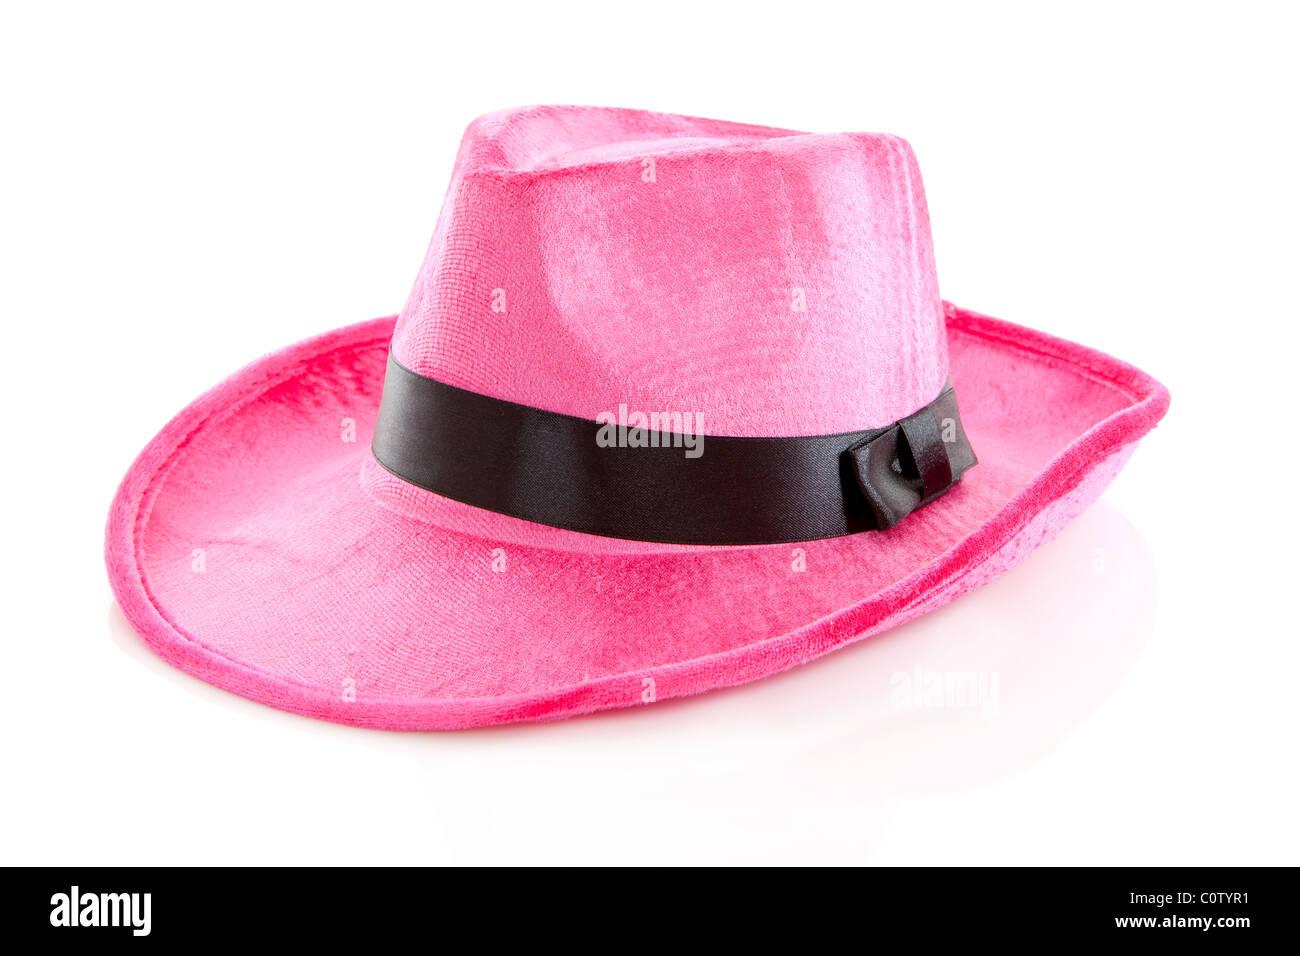 Pink mafia hat over white background - Stock Image